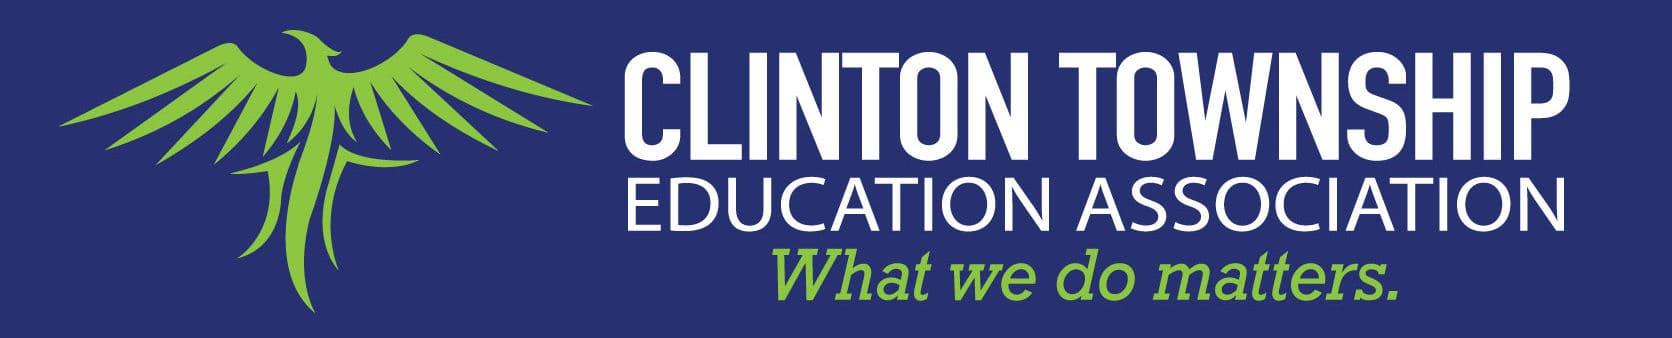 Clinton Township Education Association